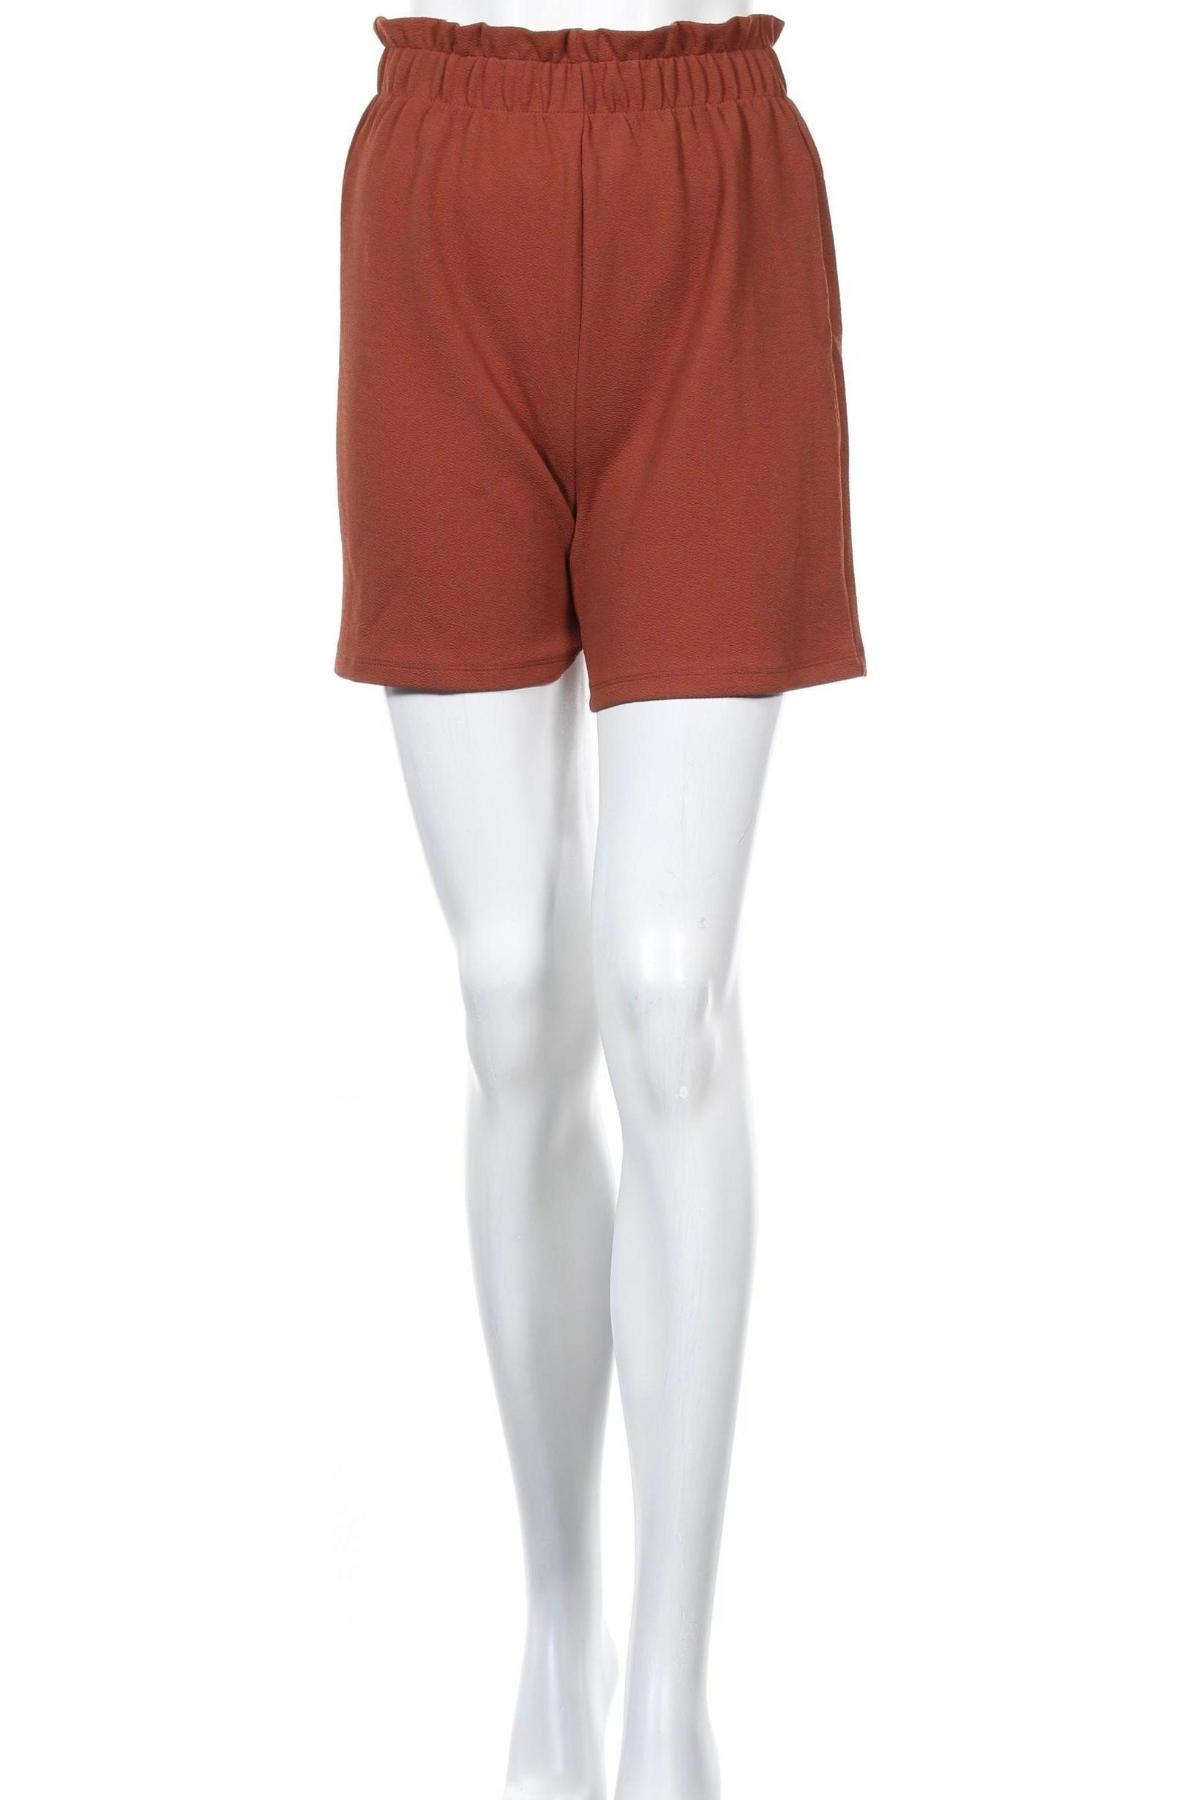 Дамски къс панталон Vero Moda, Размер XS, Цвят Кафяв, 95% полиестер, 5% еластан, Цена 33,00лв.